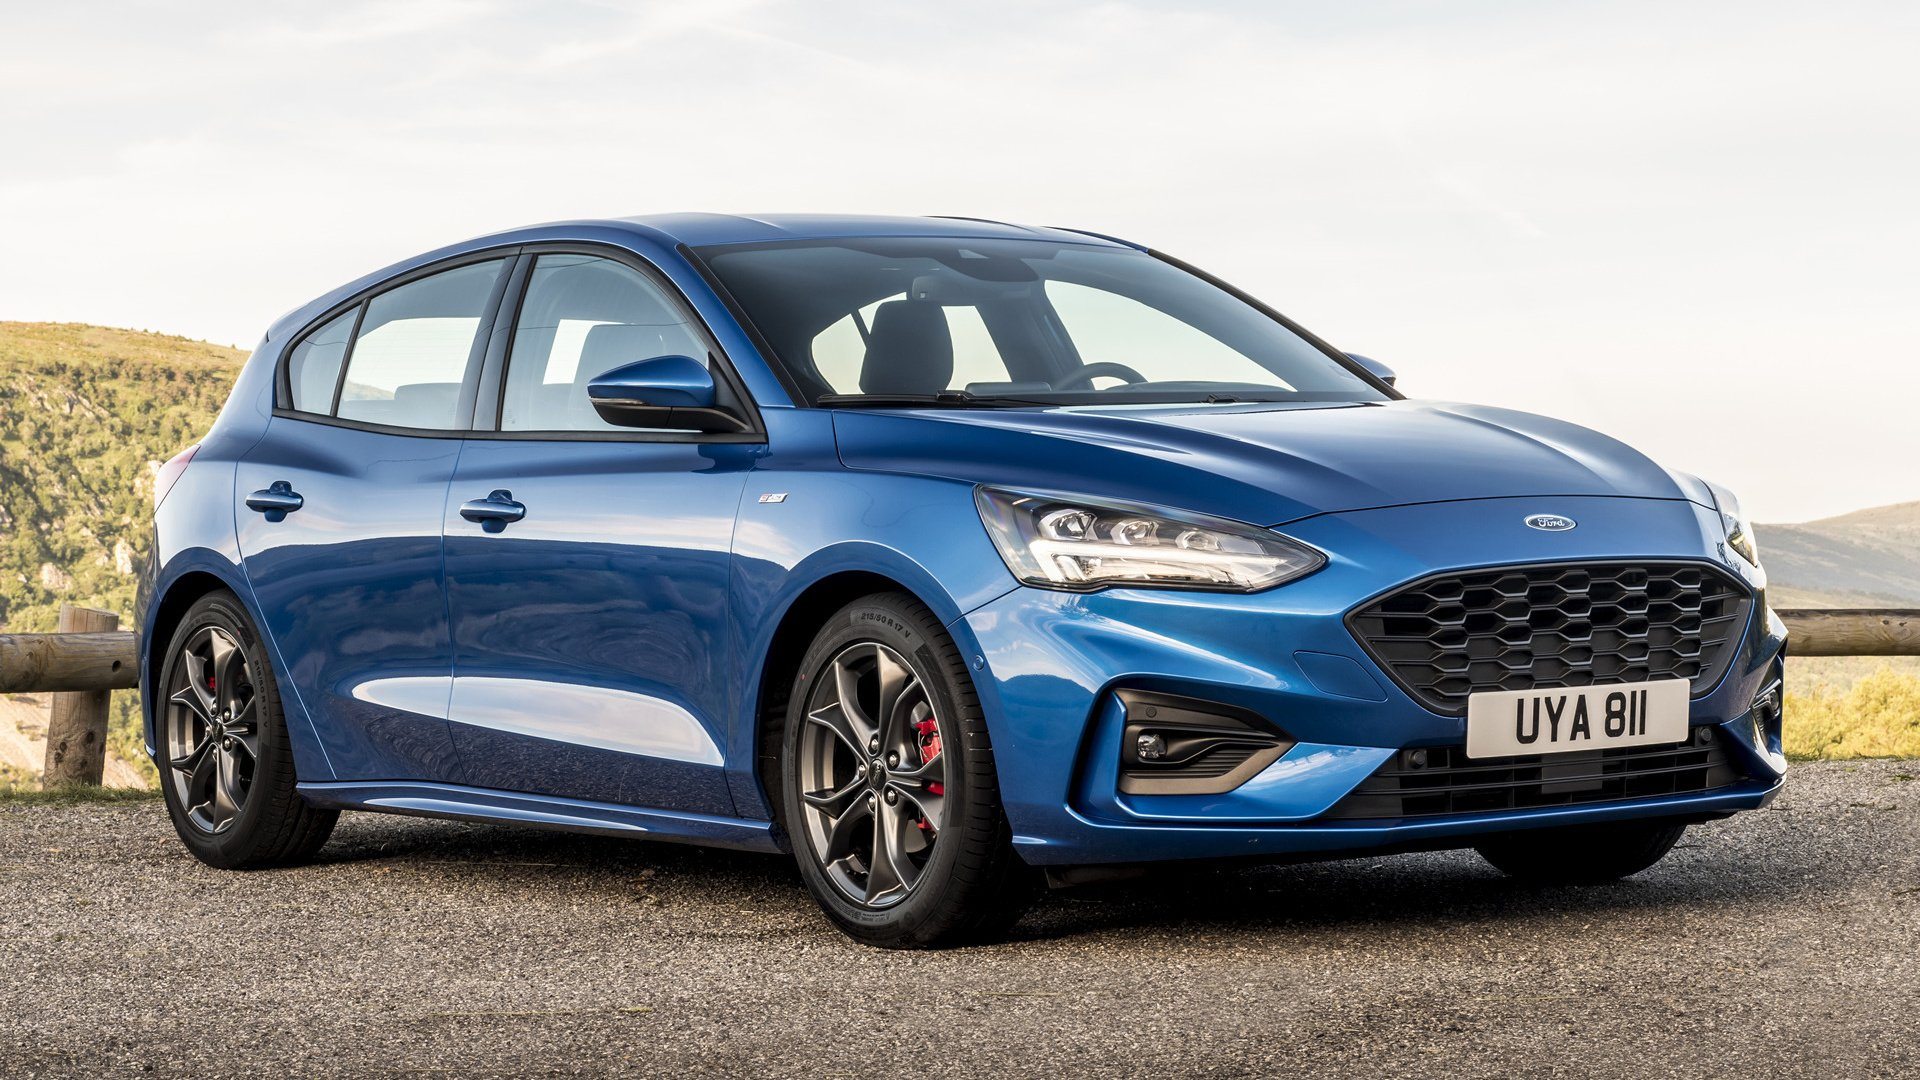 2018 Ford Focus St Line Fondo De Pantalla Hd Fondo De